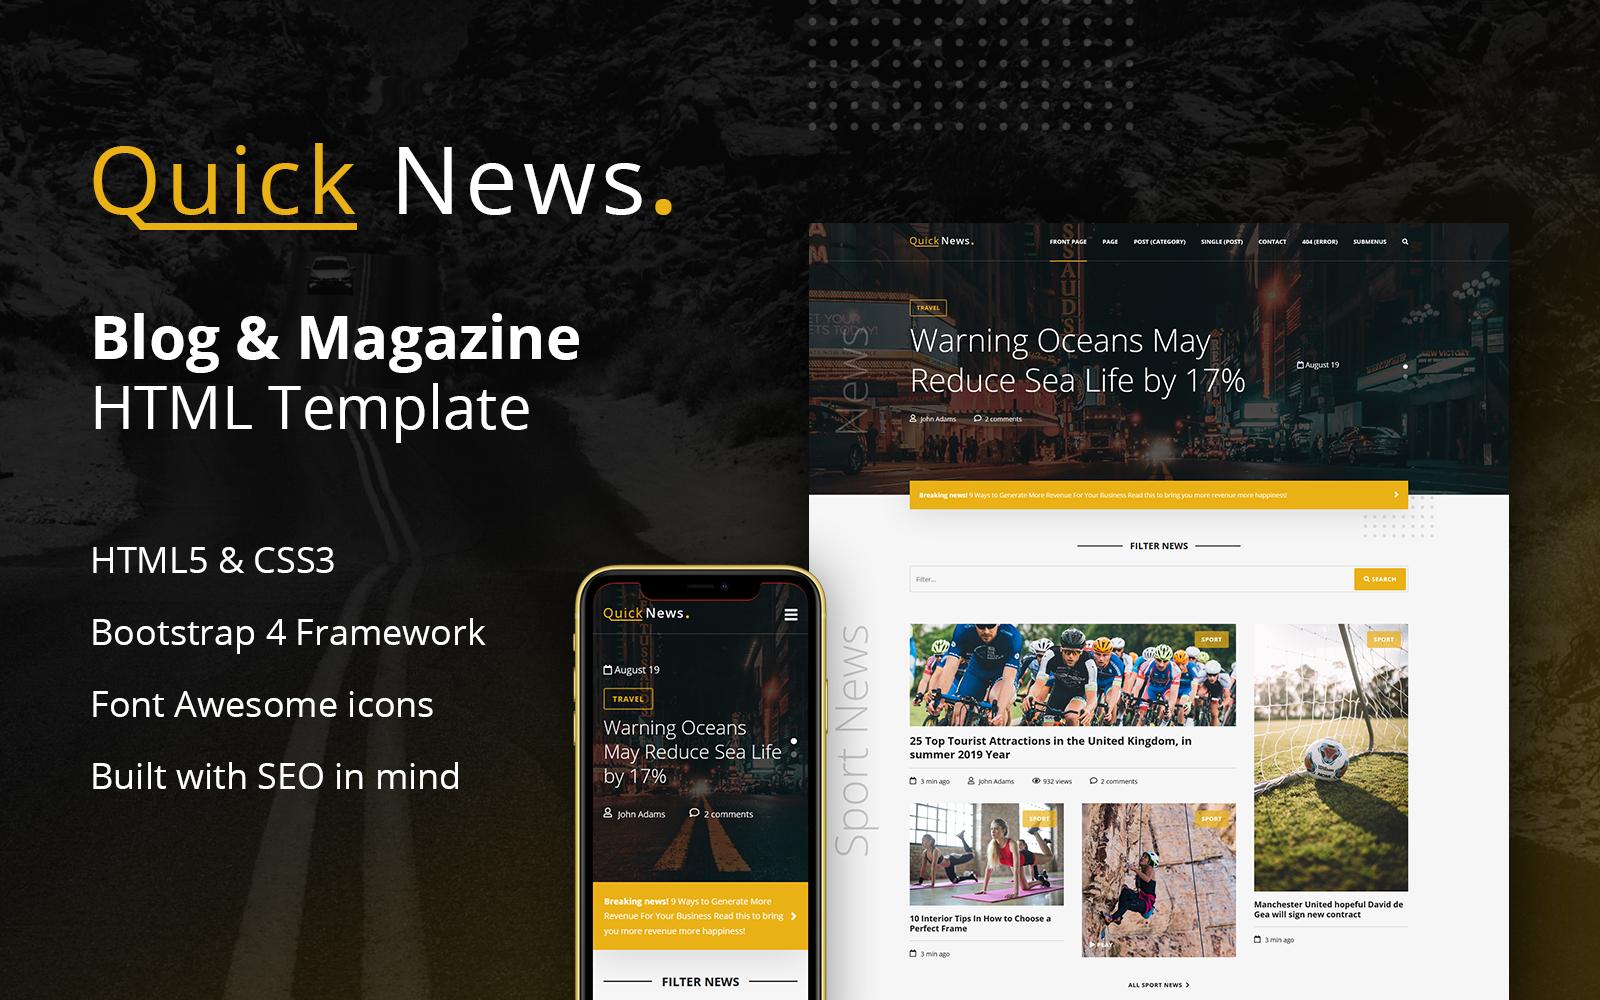 QuickNews - Blog & Magazine Website Template